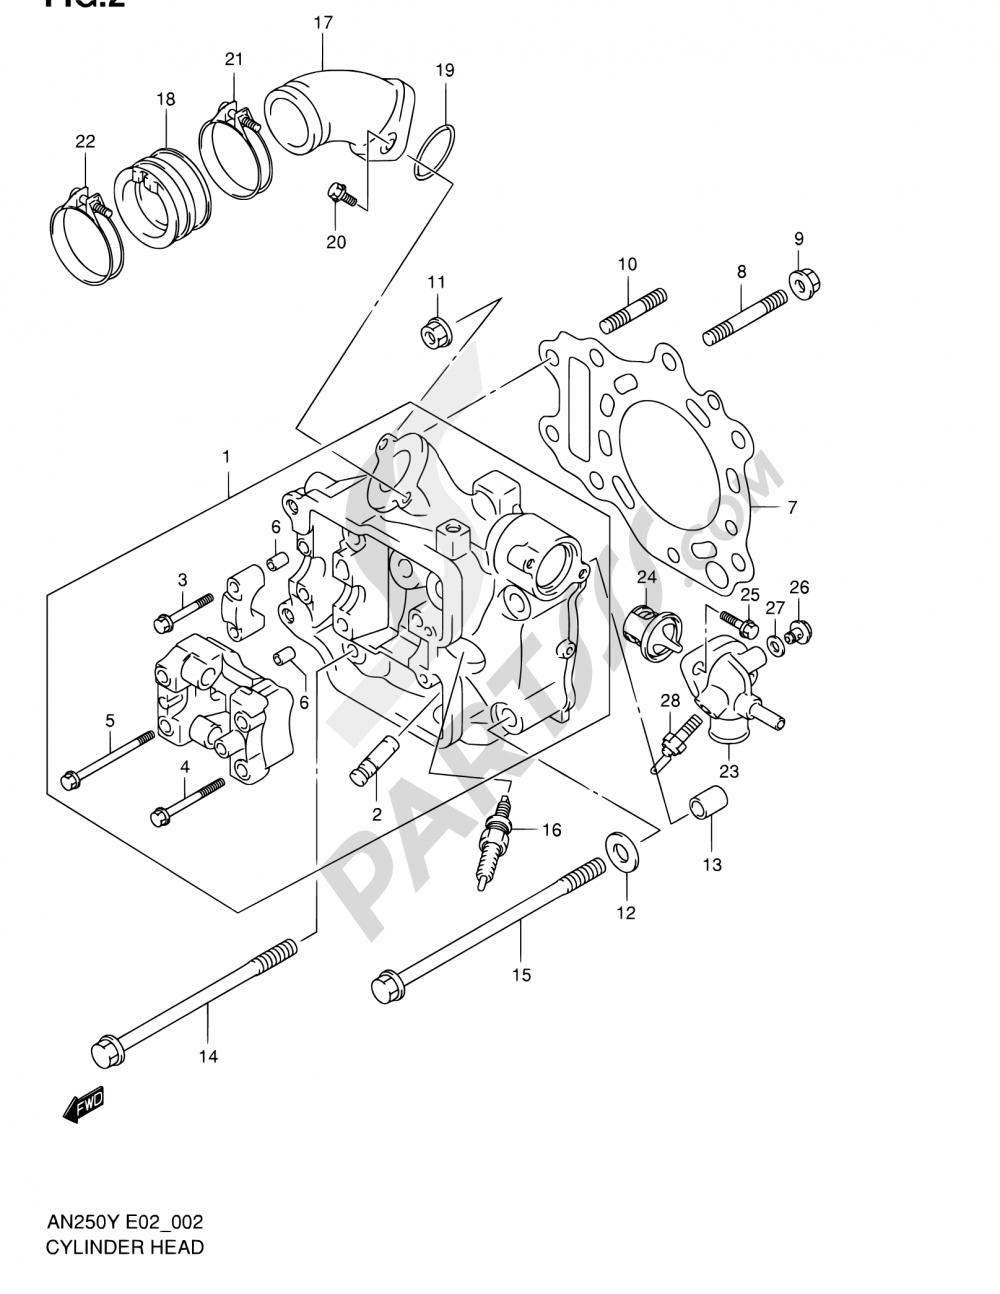 2 - CYLINDER HEAD (MODEL W/X/Y) Suzuki BURGMAN AN250 2000